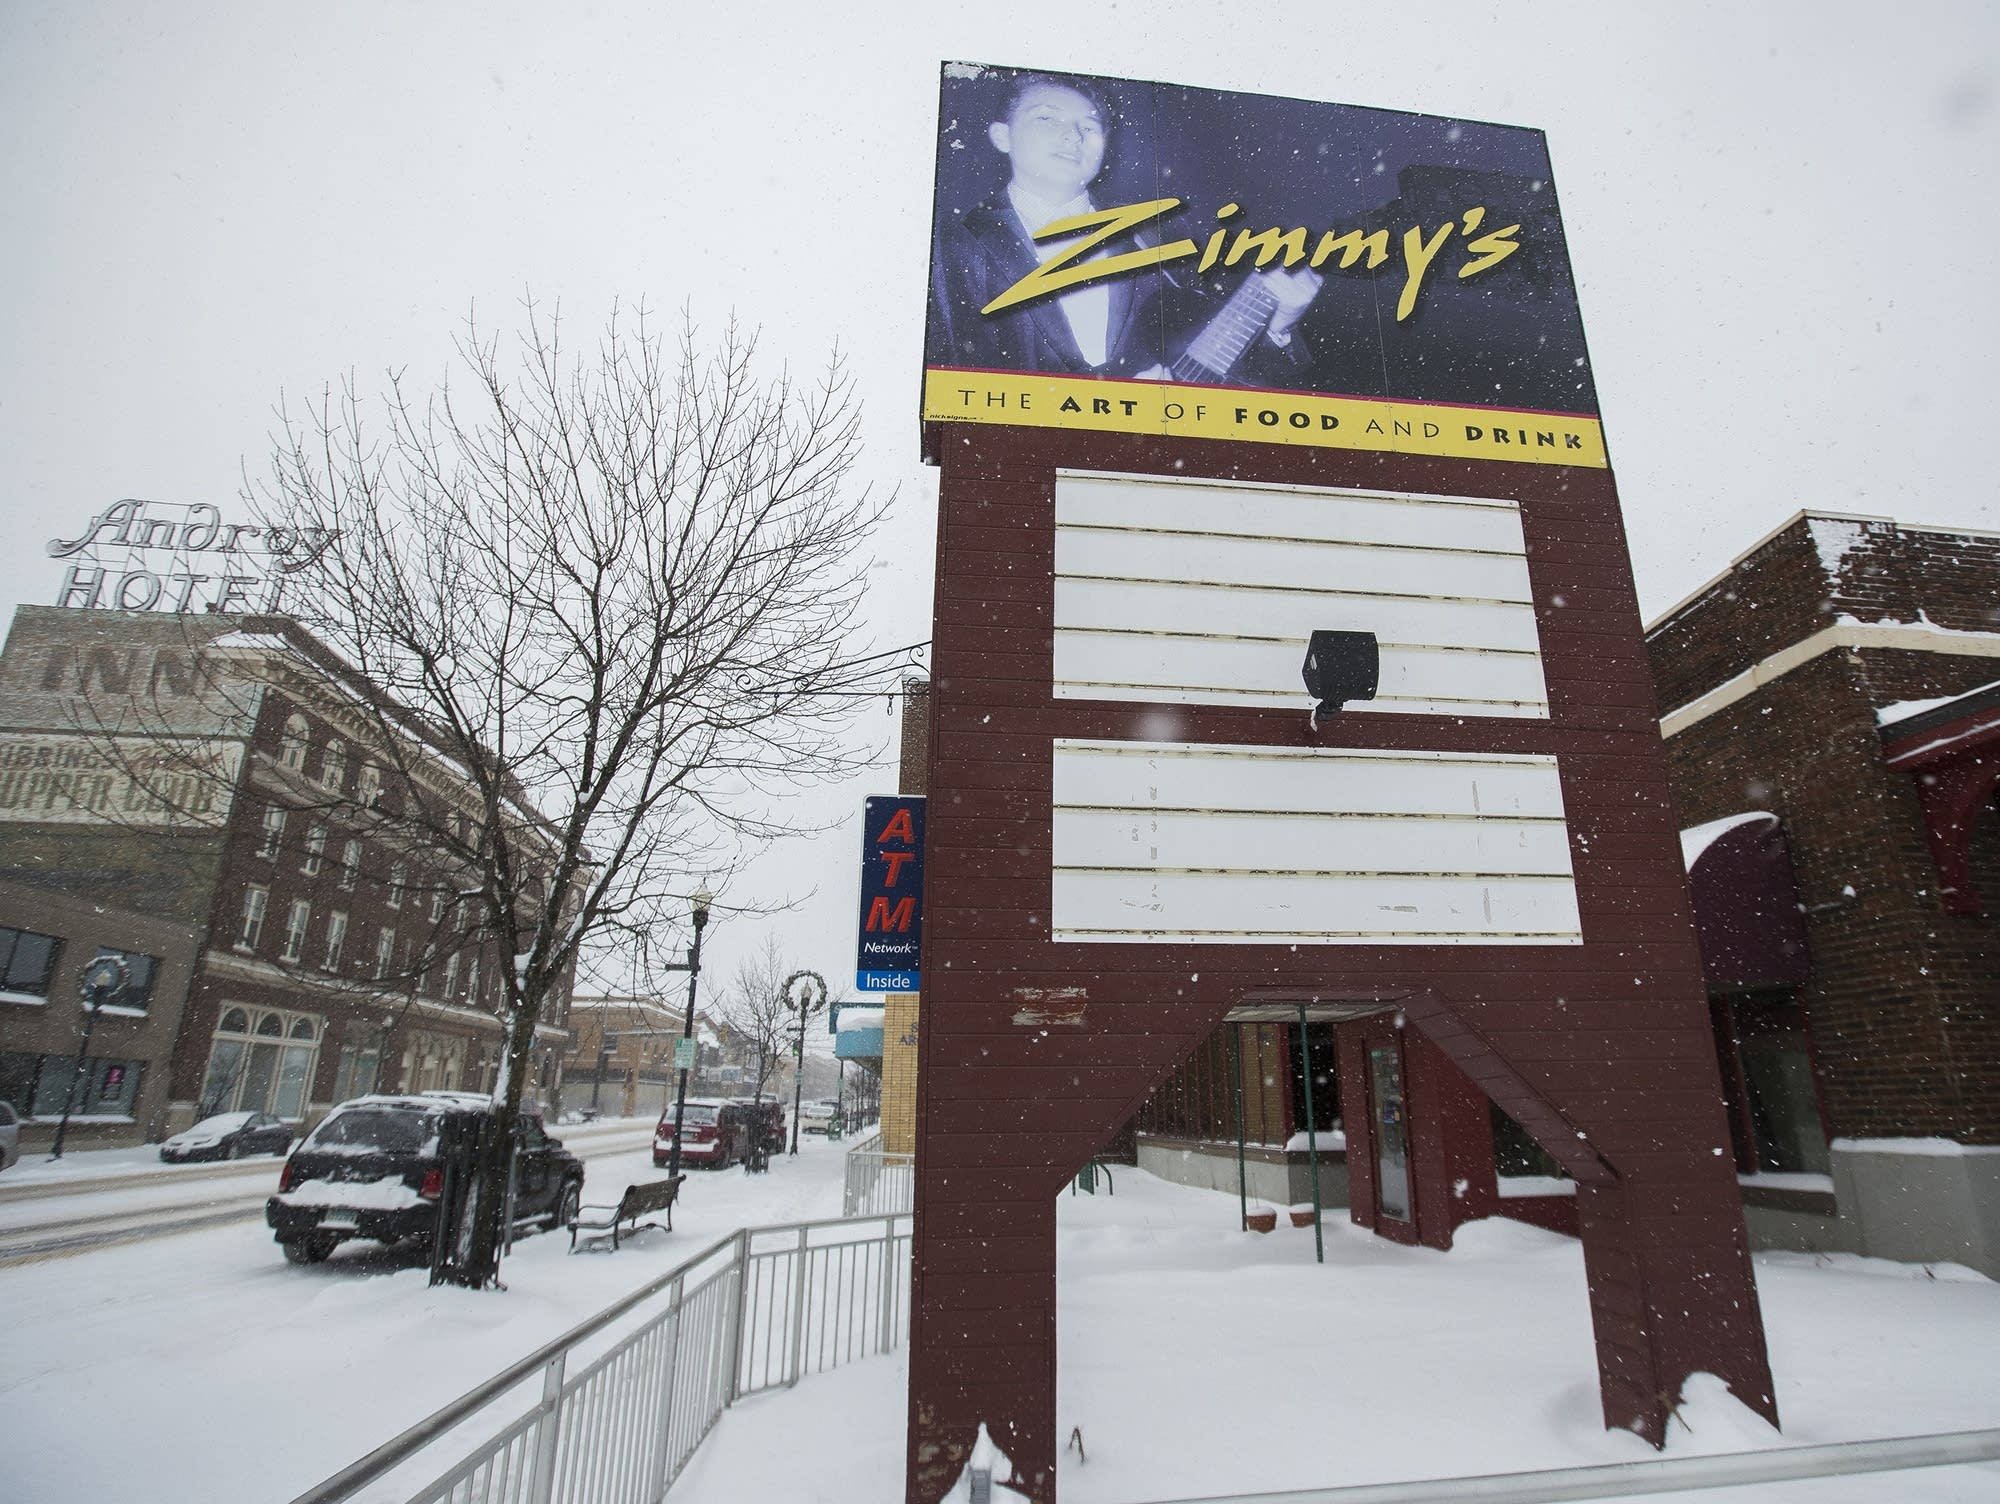 The former Zimmy's restaurant in Hibbing, Minn.